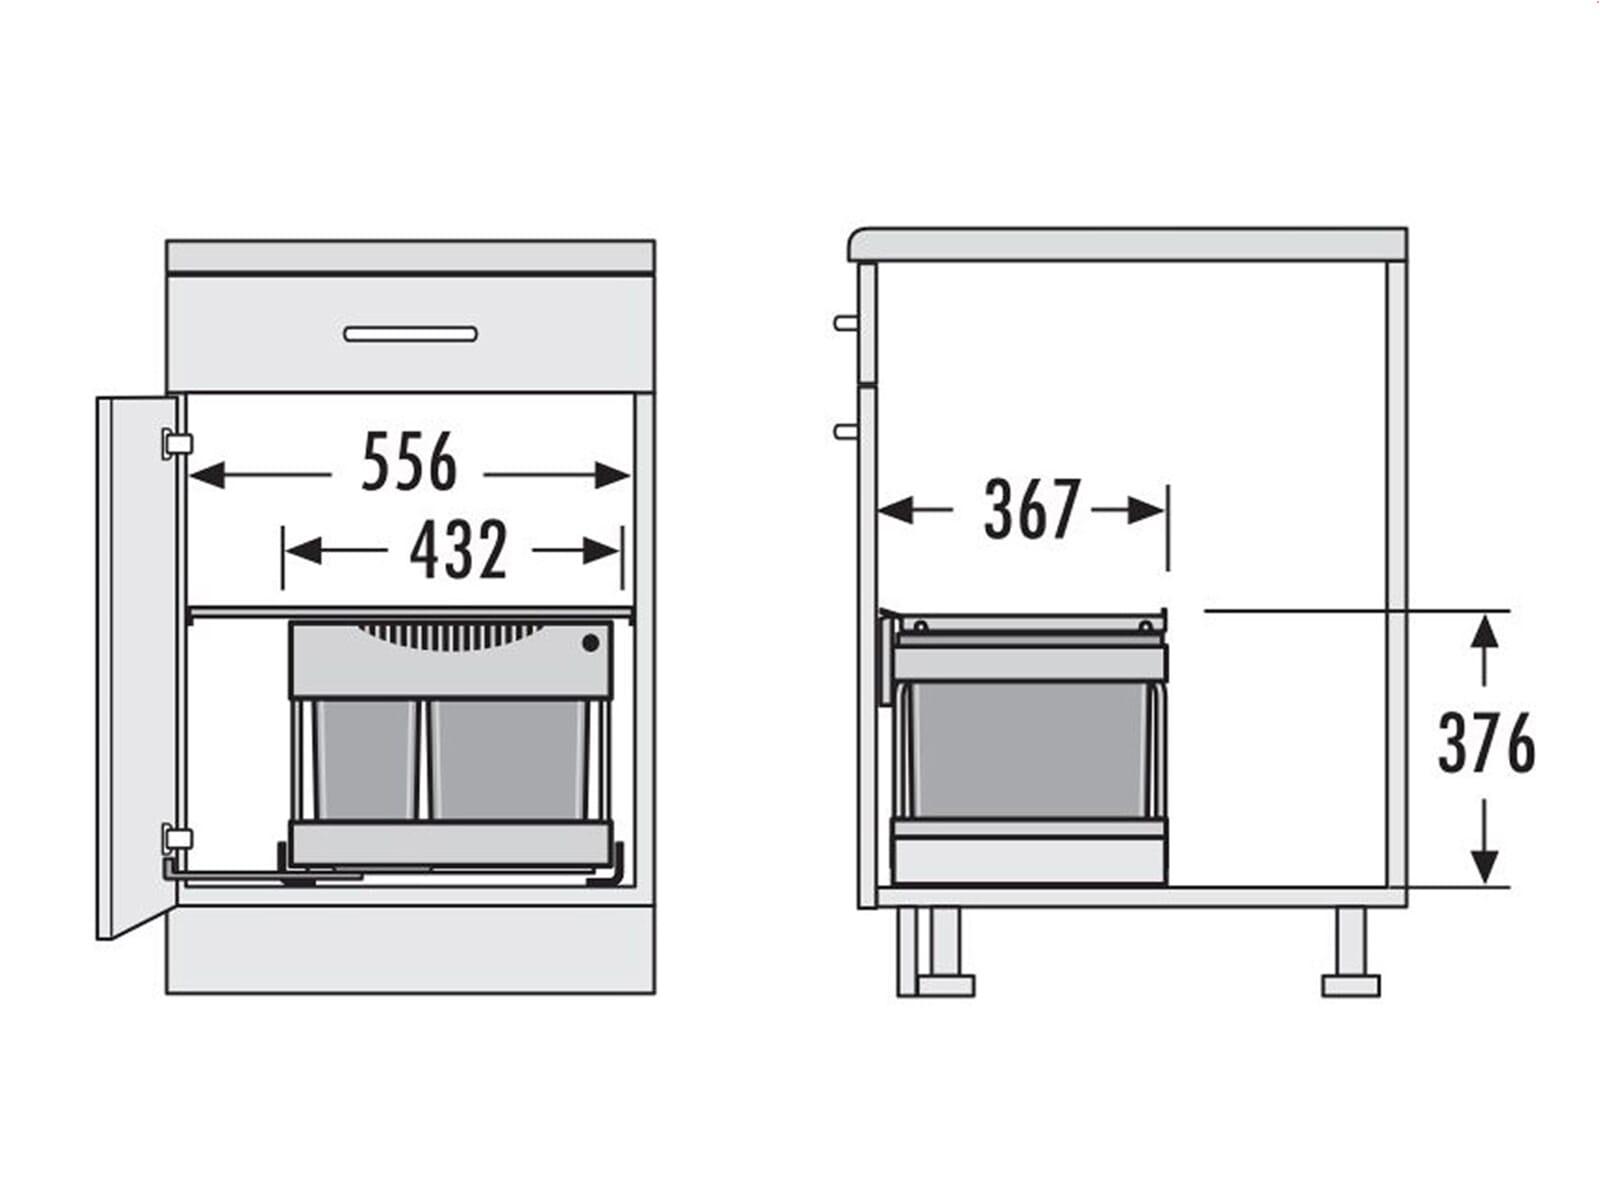 hailo automatic raumspar tandem 3644801 einbau abfallsammler. Black Bedroom Furniture Sets. Home Design Ideas